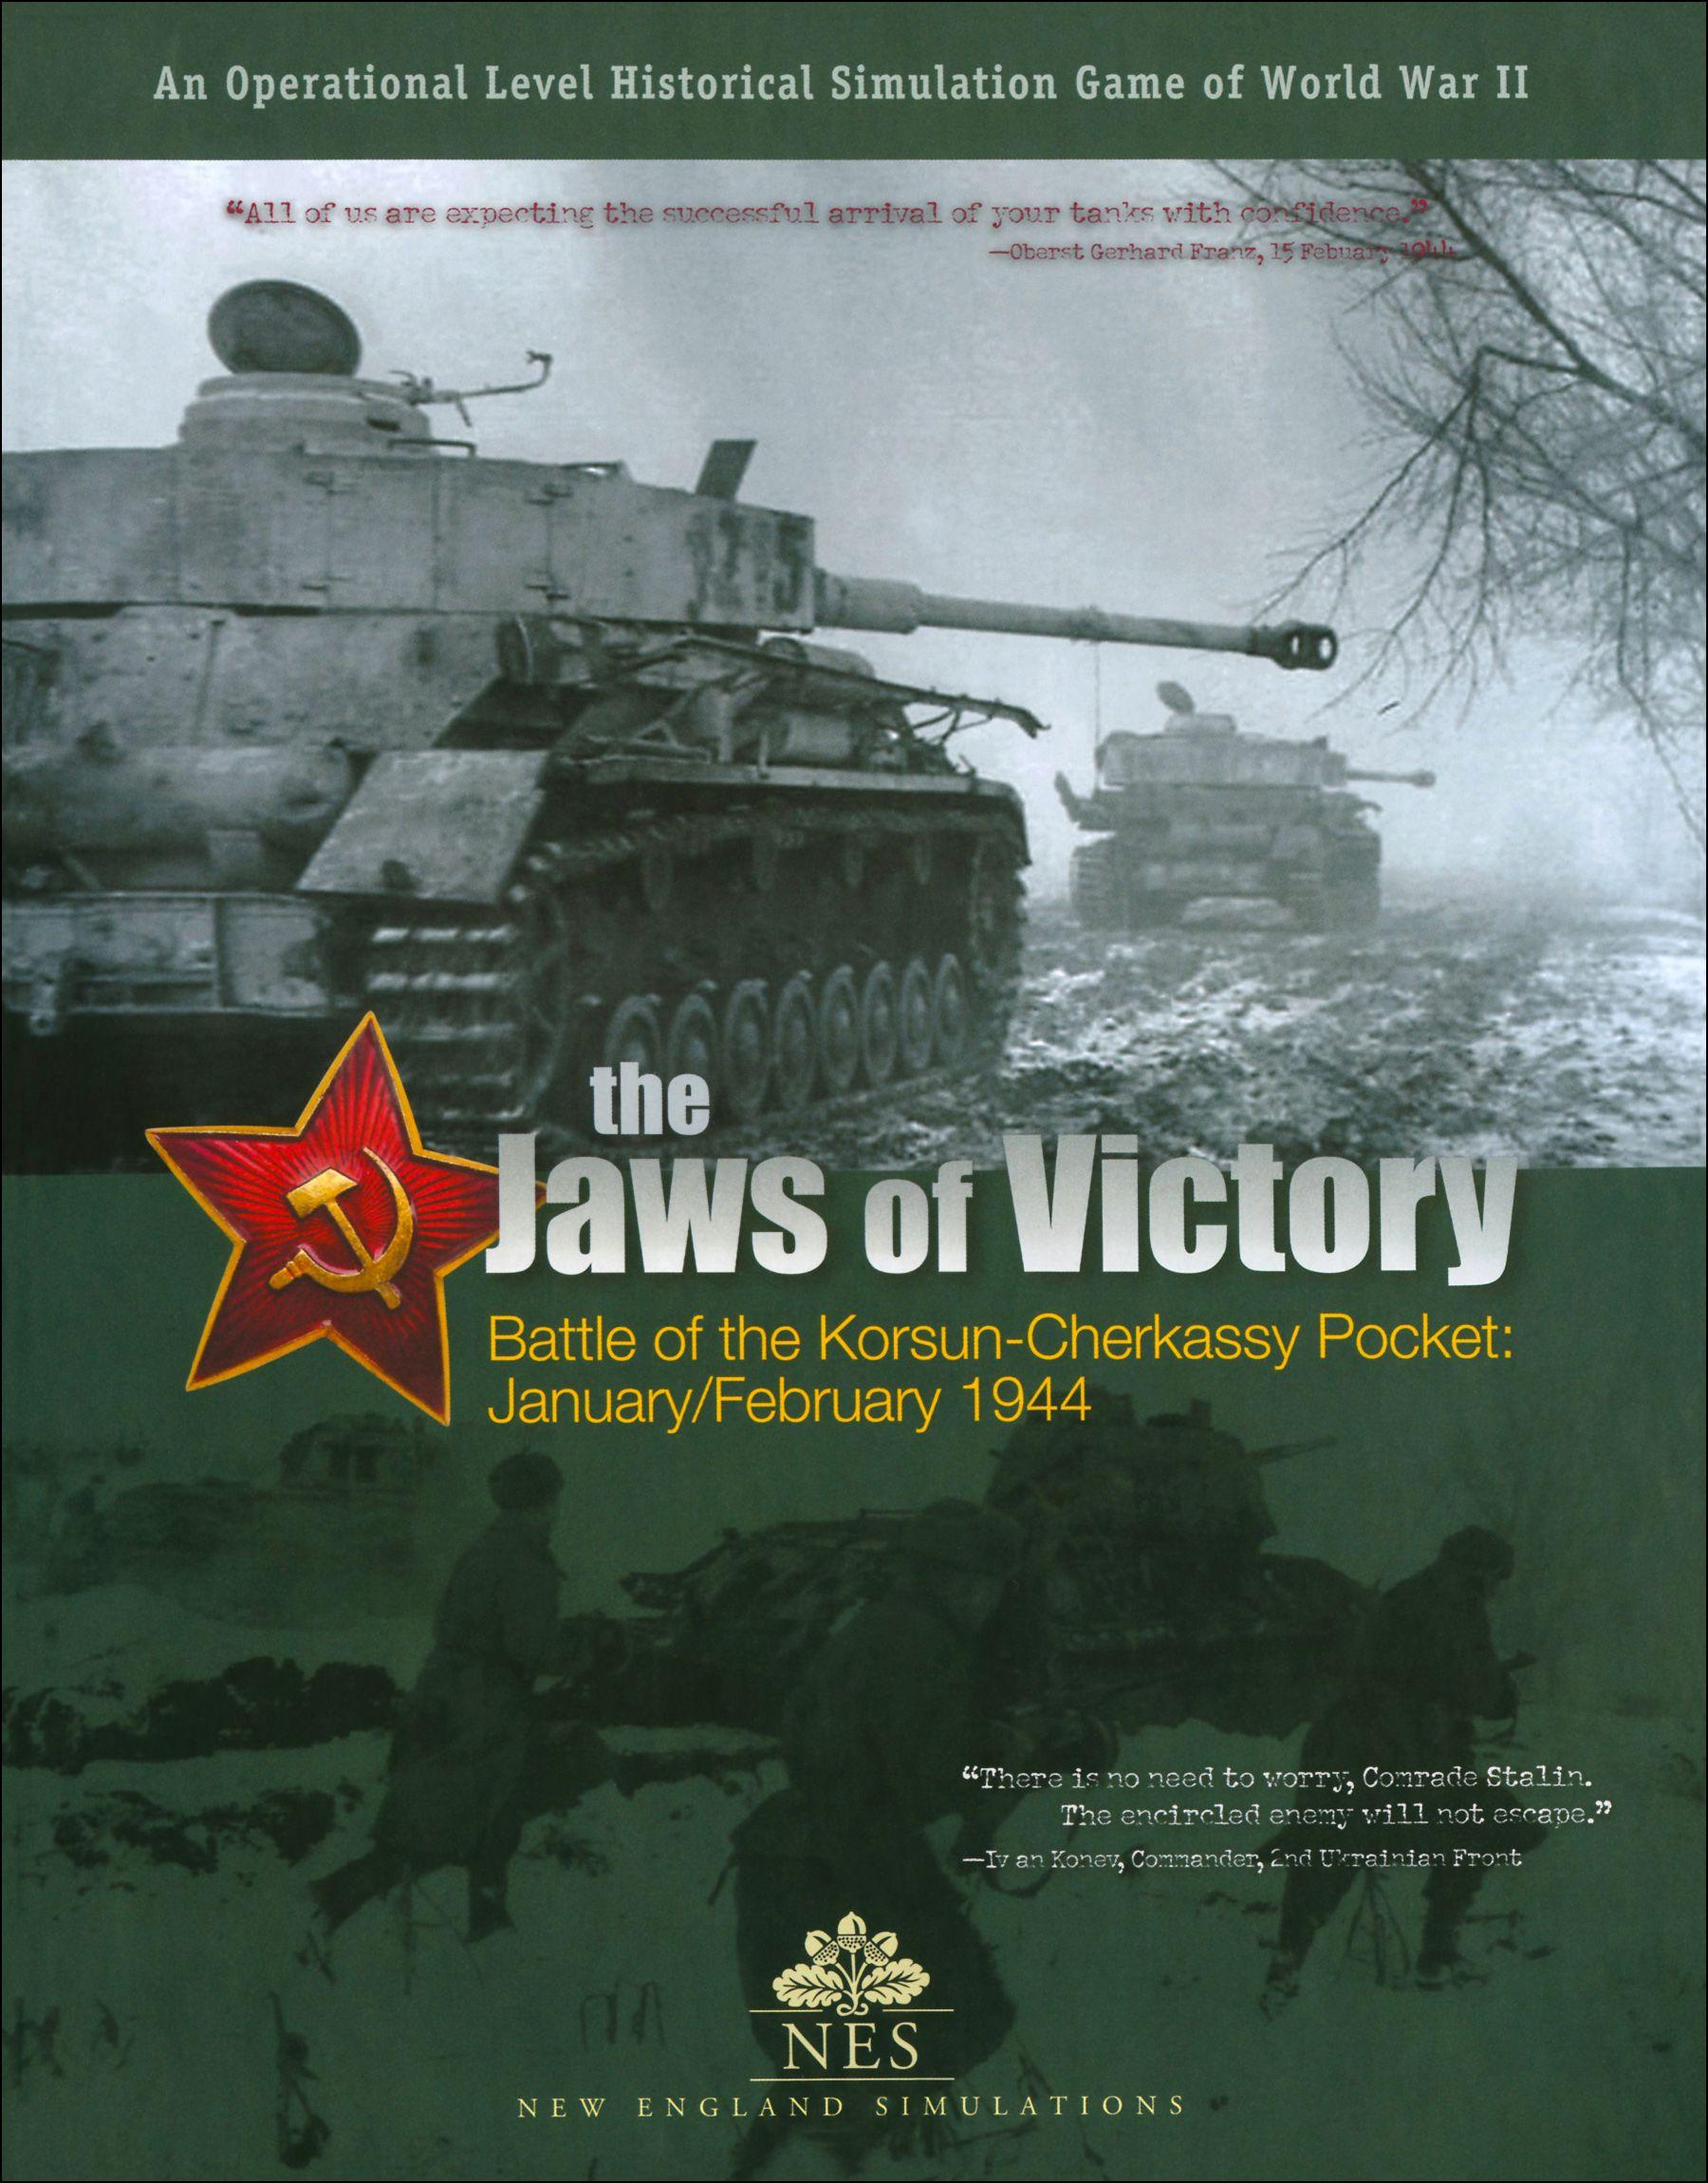 The Jaws of Victory: Battle of Korsun-Cherkassy Pocket – January/February 1944